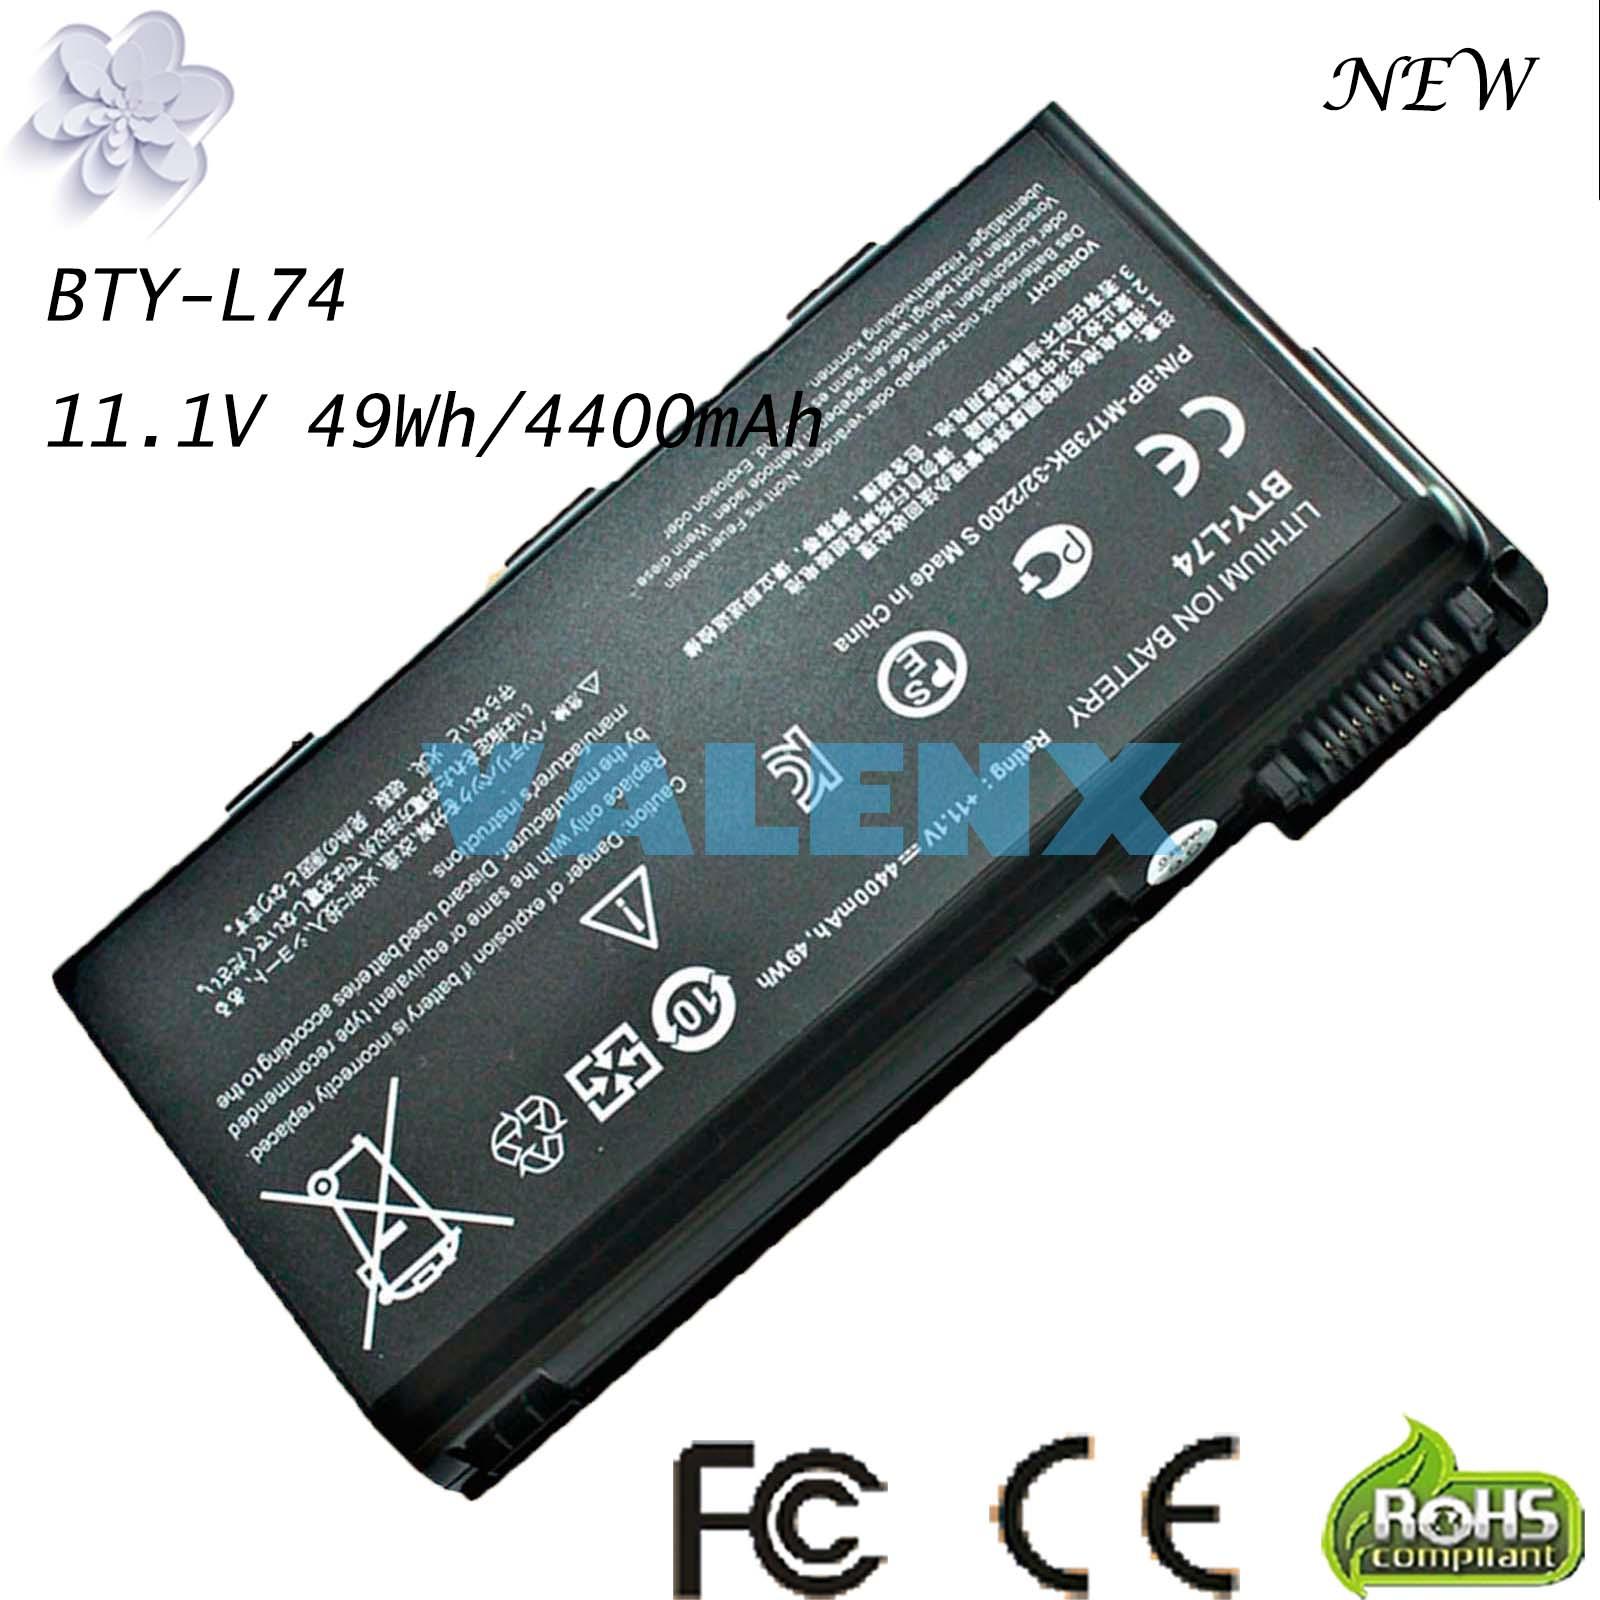 BTY-L74 بطارية كمبيوتر محمول ل MSI A5000 A6000 A6200 CR600 CR600 CR620 CR700 CX600 CX700 جميع سلسلة MSI CX620 A7005